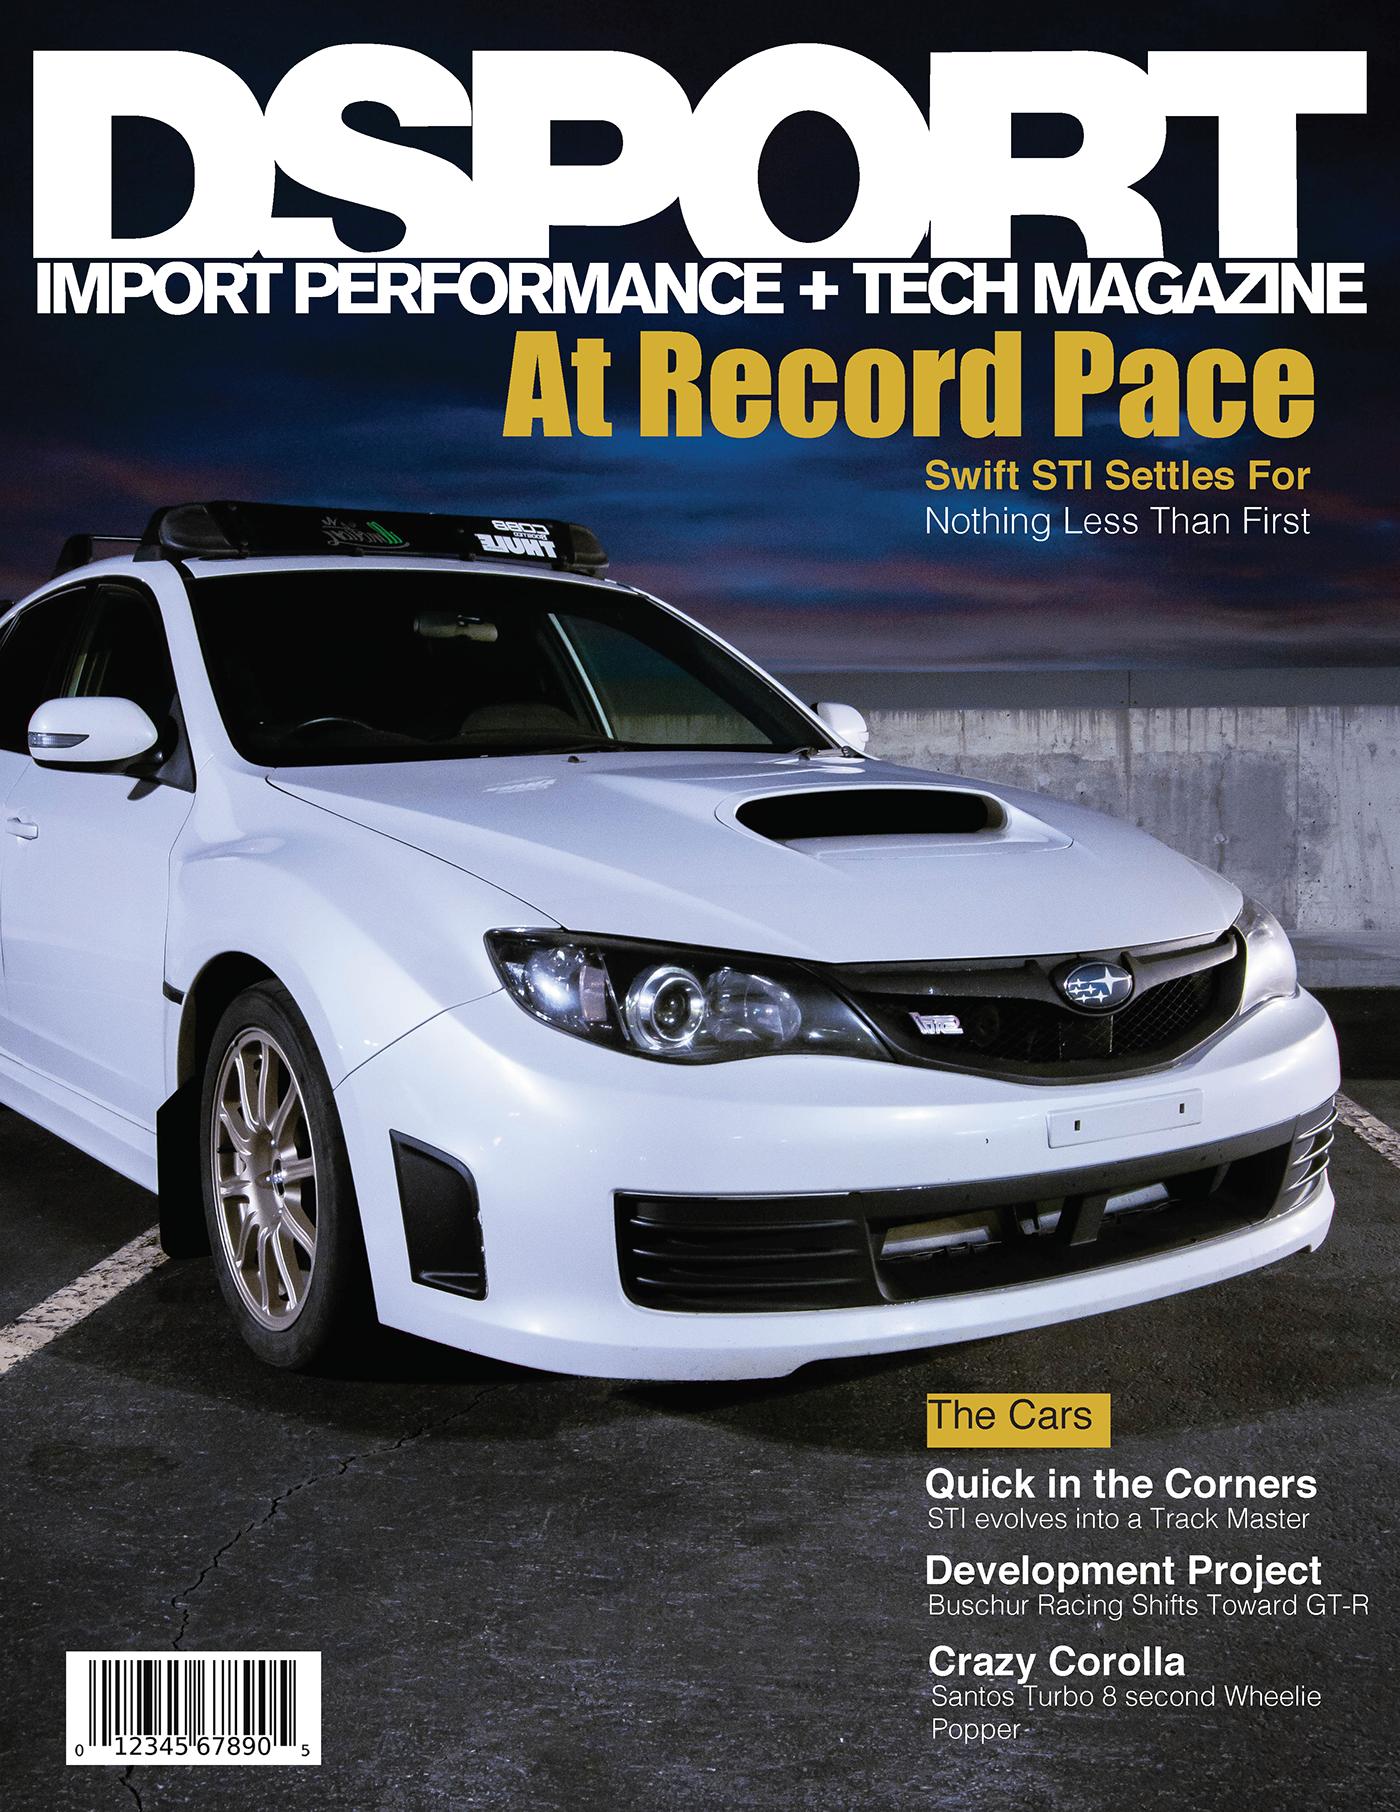 Car Magazine: Photography on Behance